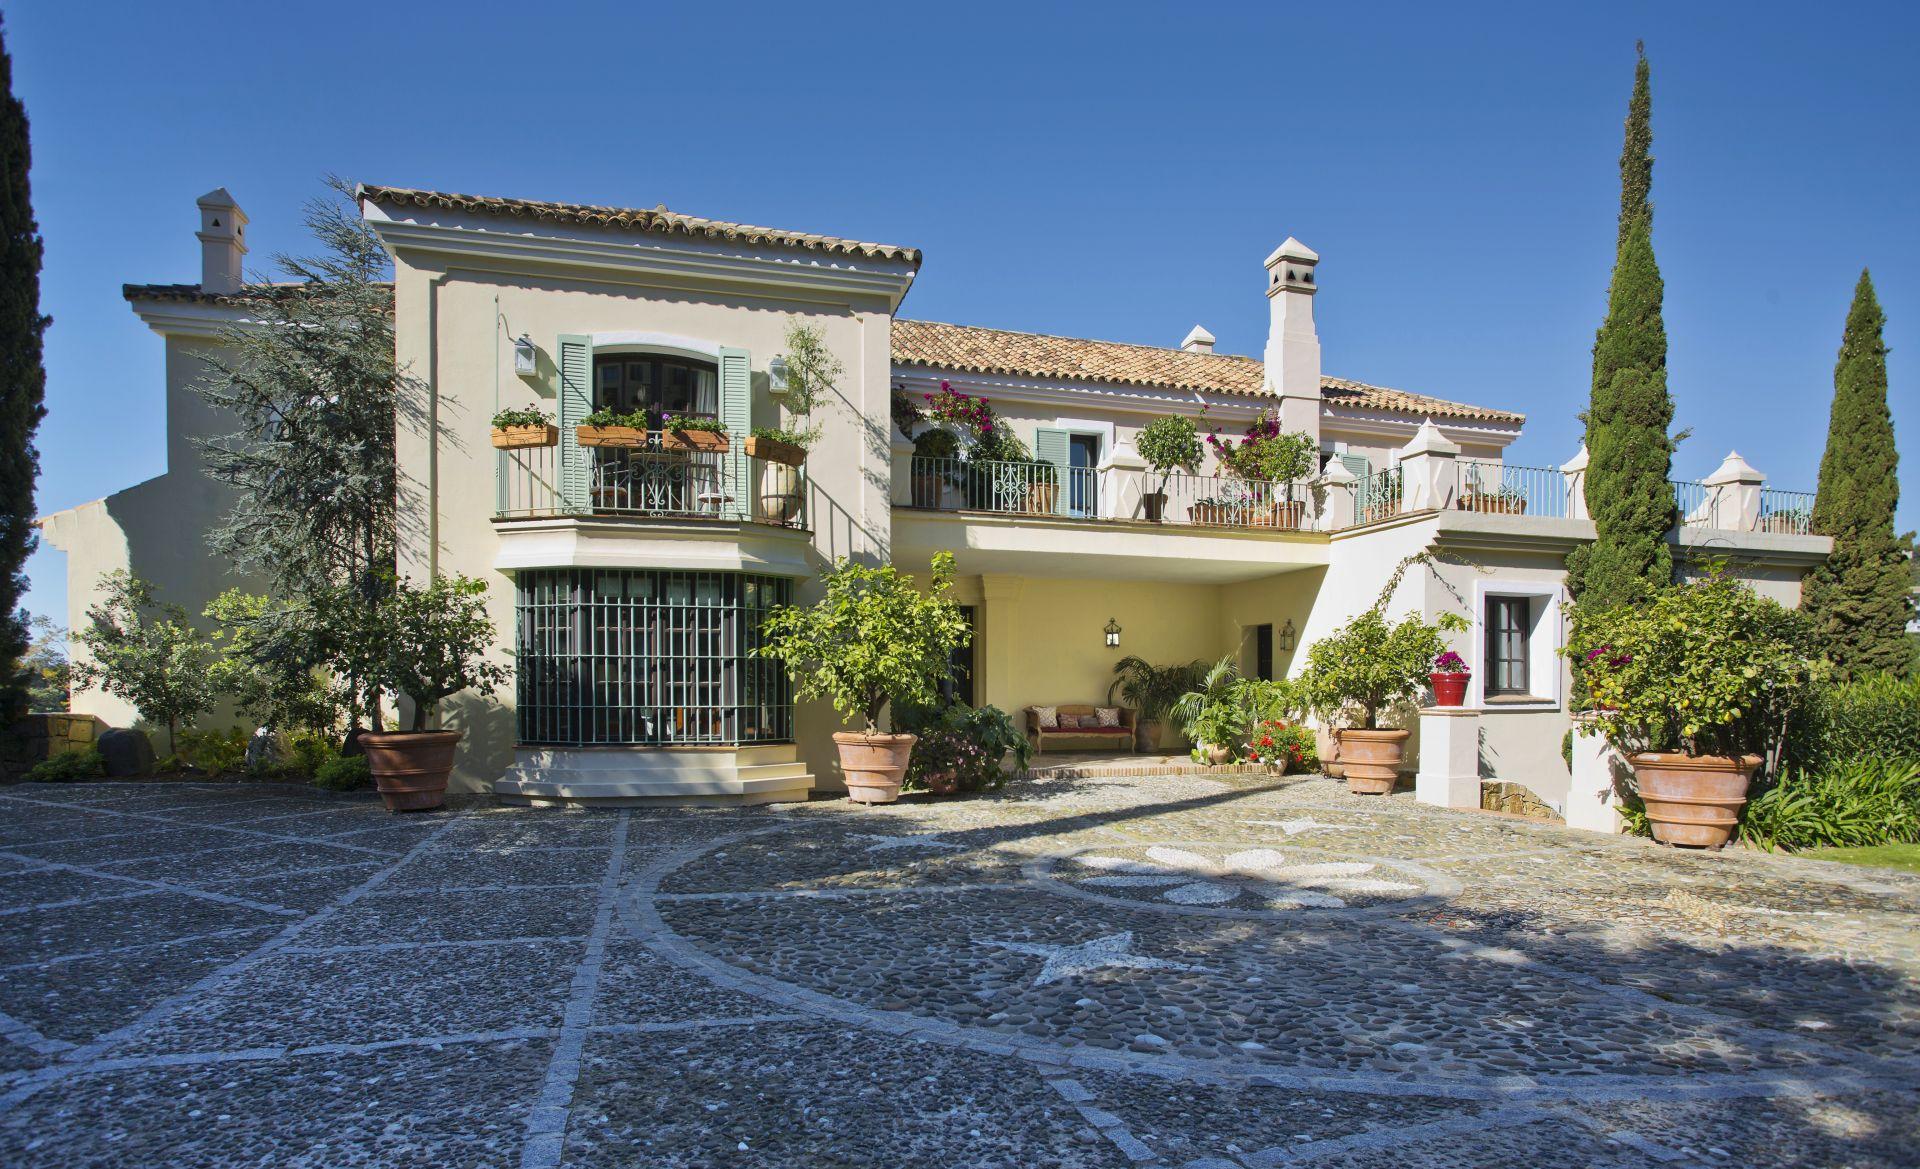 Casa La Guapa - A Mediterranean Dream Home | Christie's International Real Estate